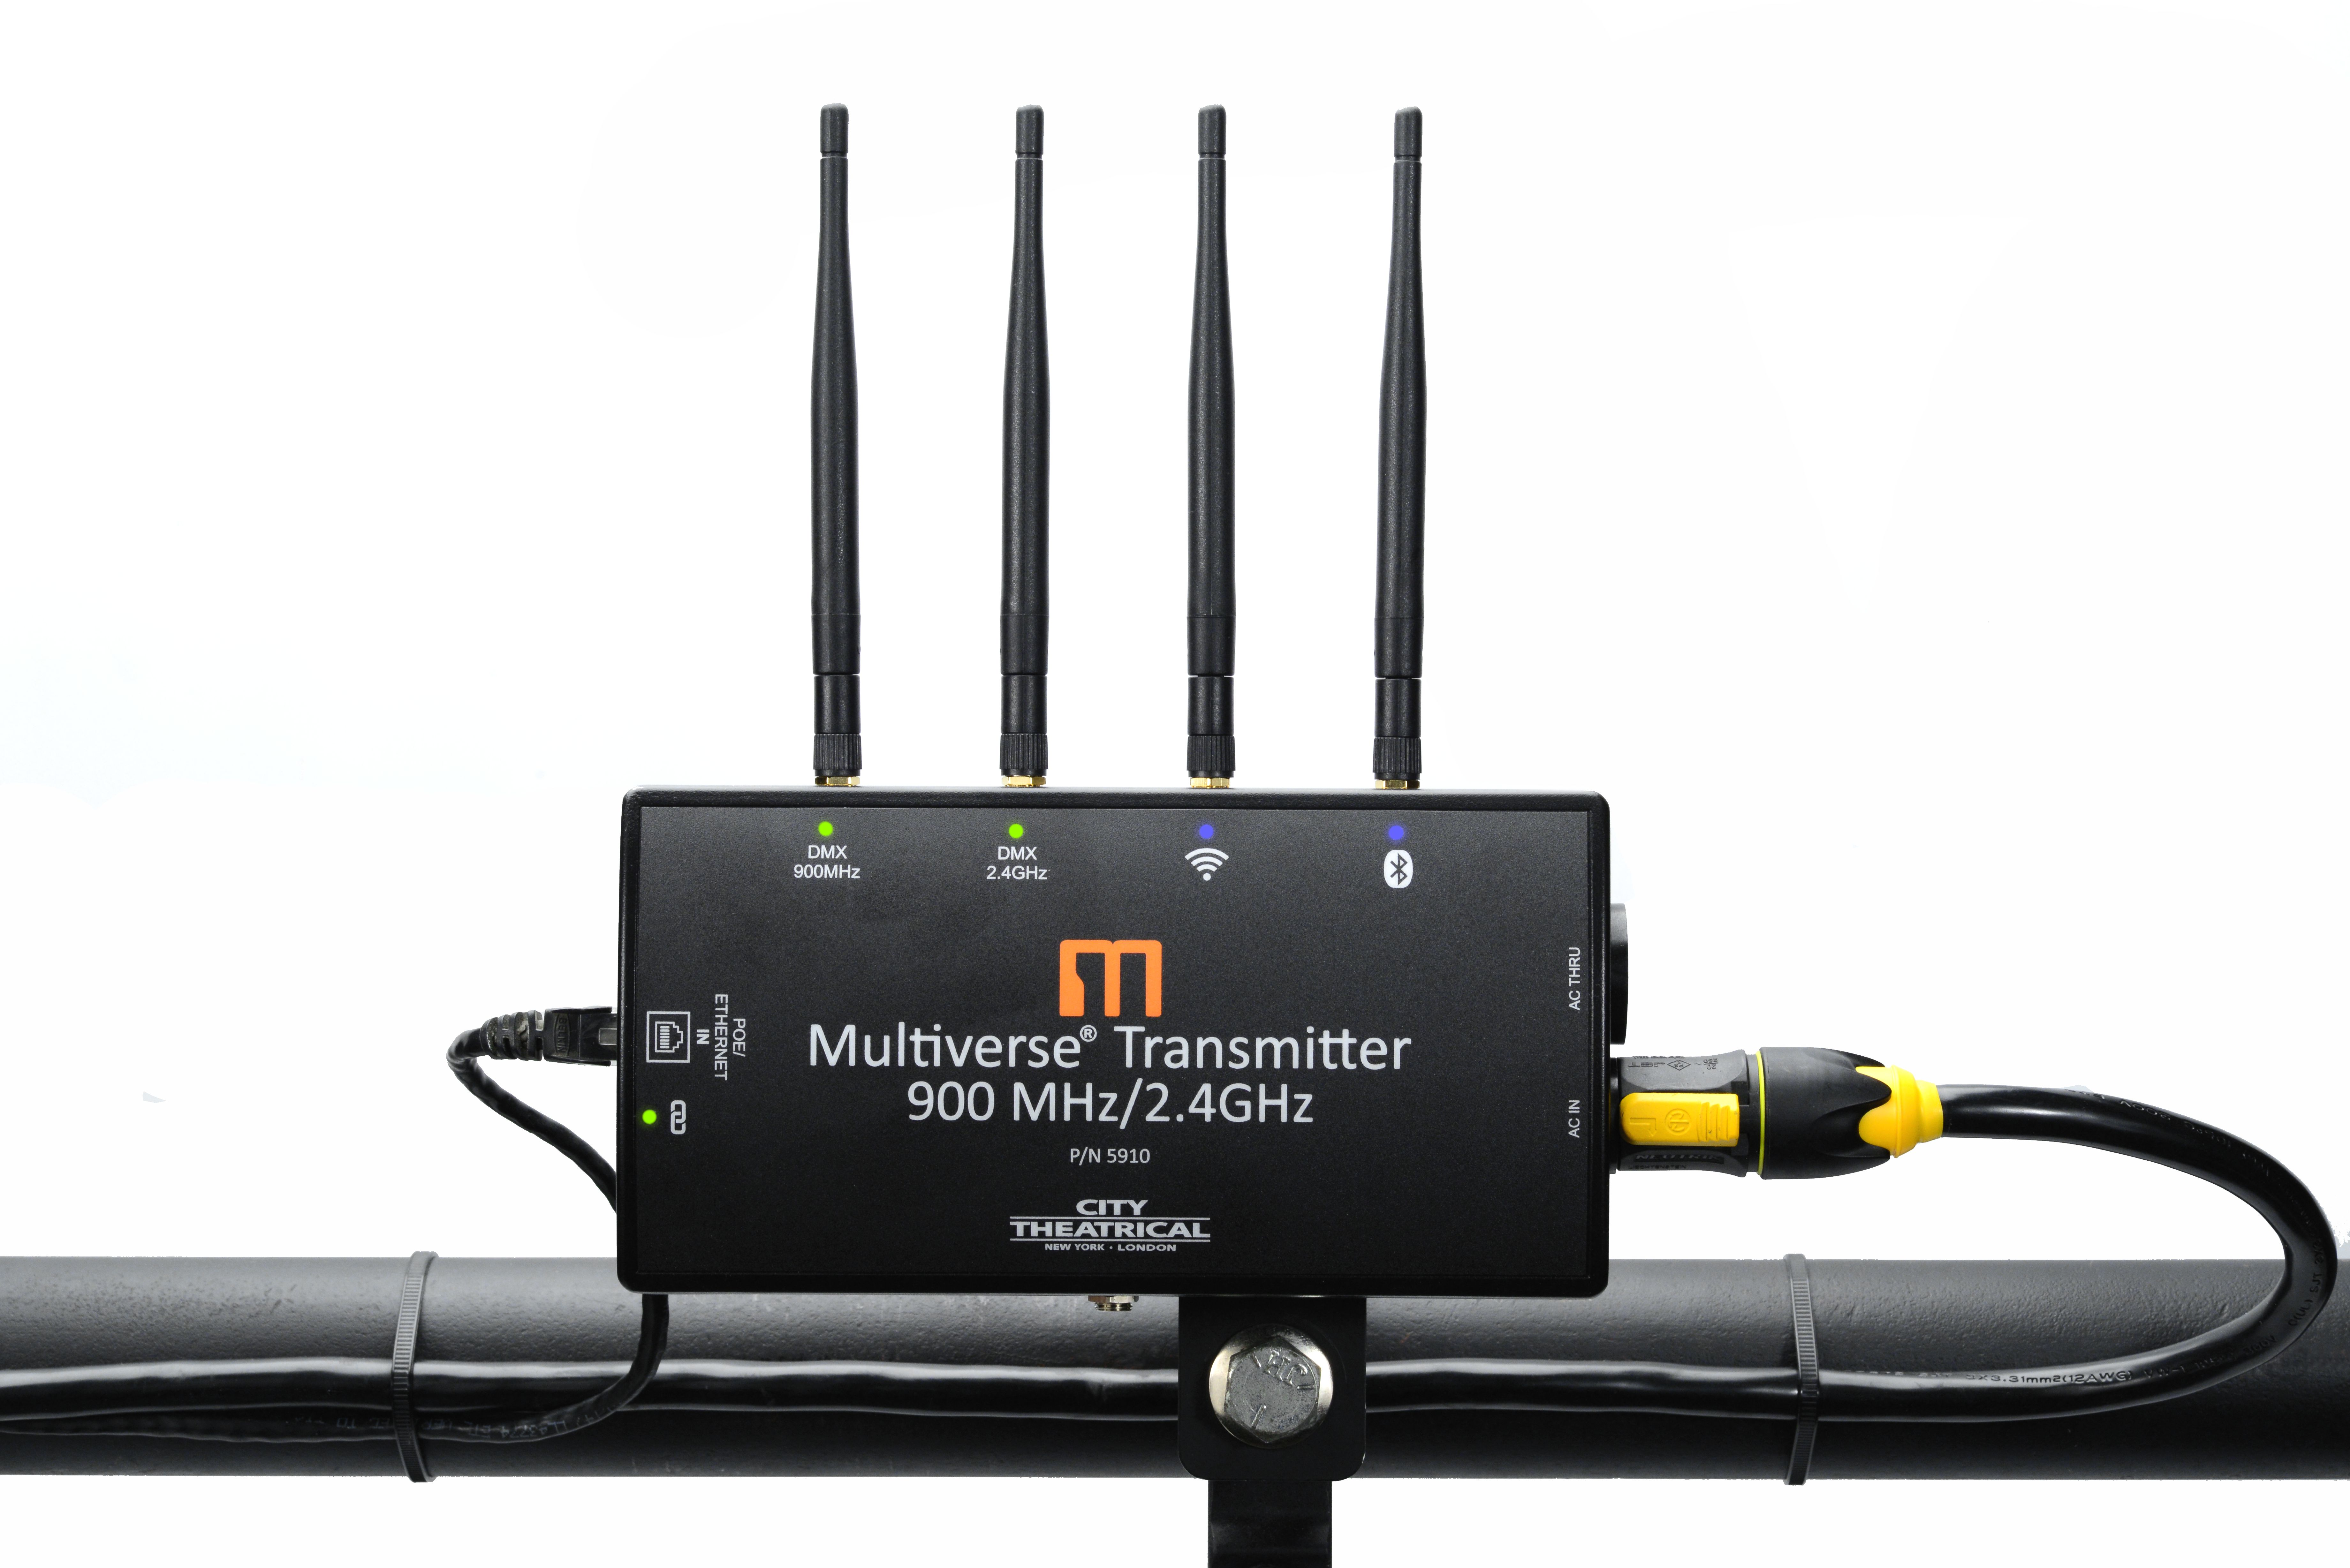 Multiverse Transmitter 3